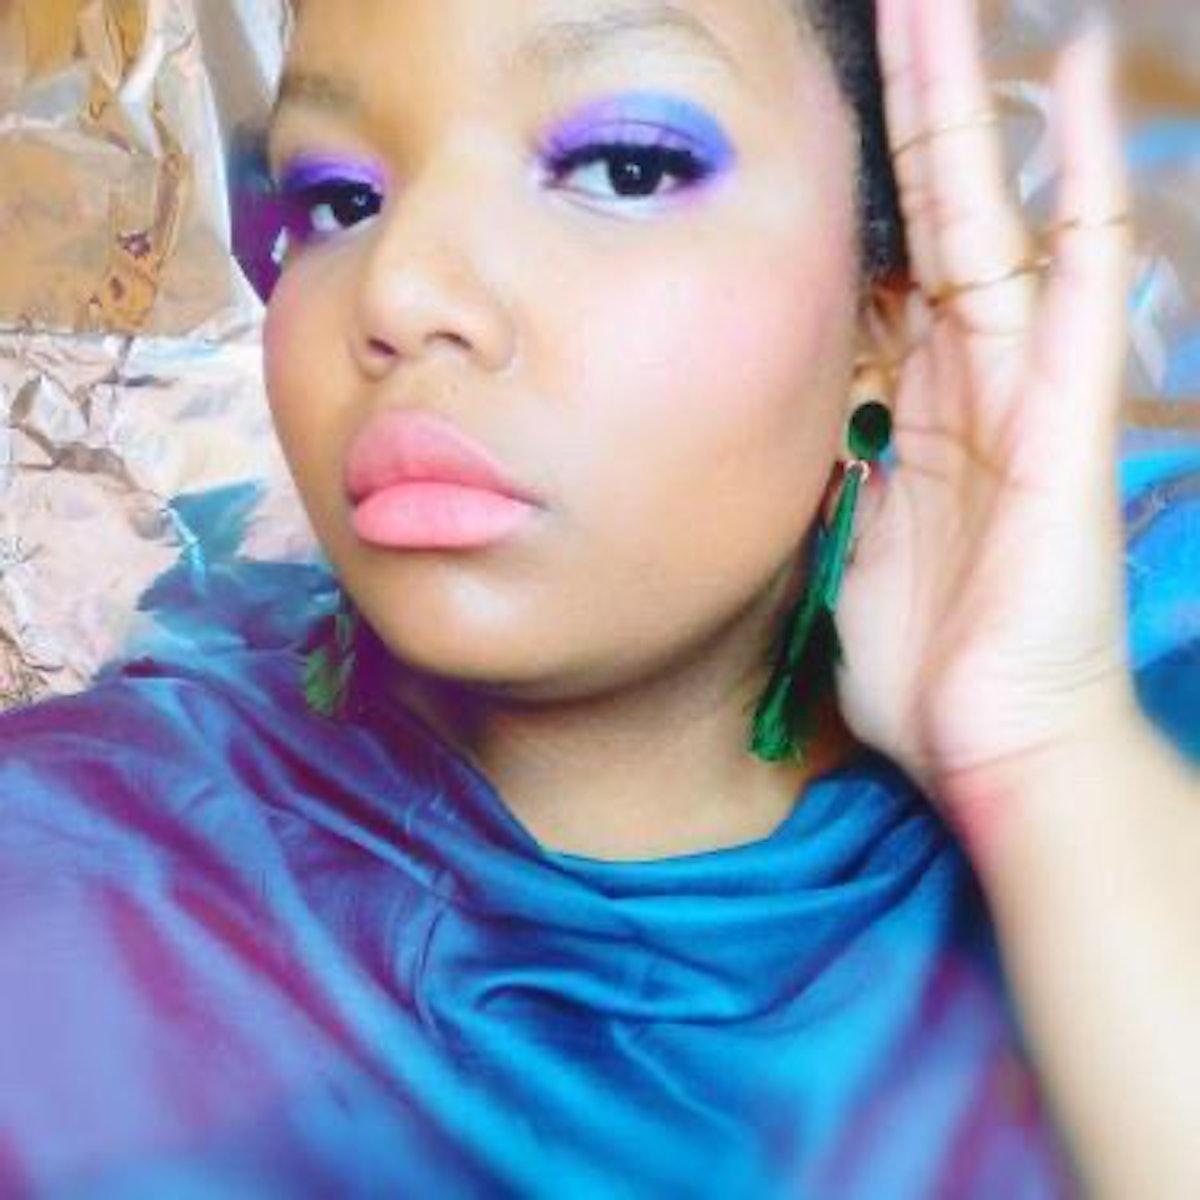 Emeralf Elitou in a gorgeous, full-glam, purple eyeshadow makeup look